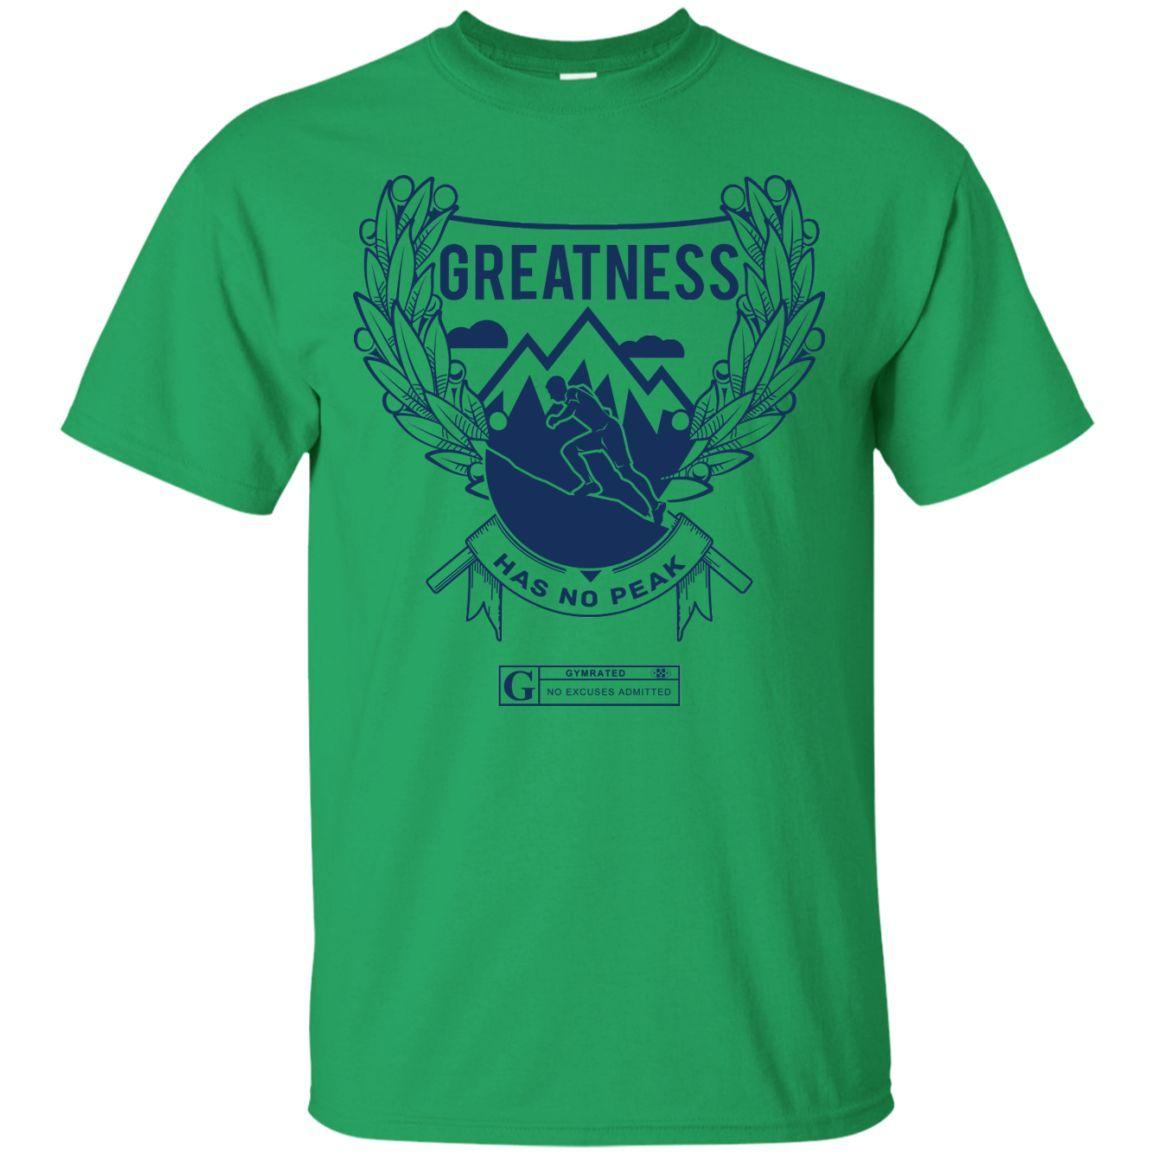 """Greatness Has No Peak"" Men's Tees & Tanks"